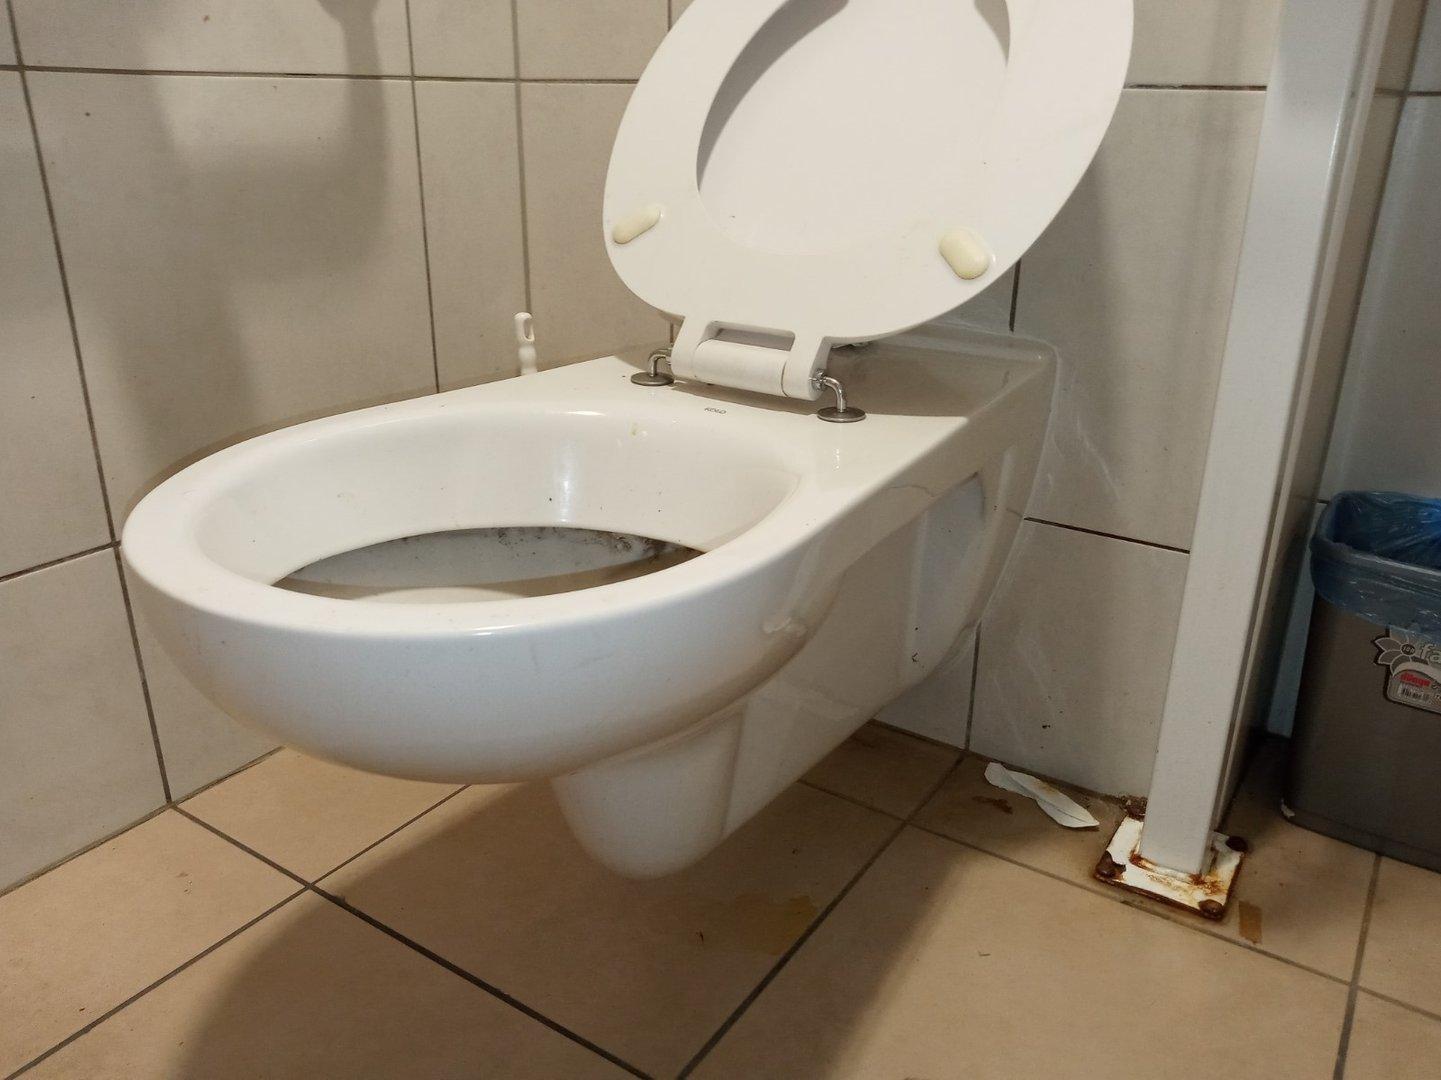 Toilet-pan